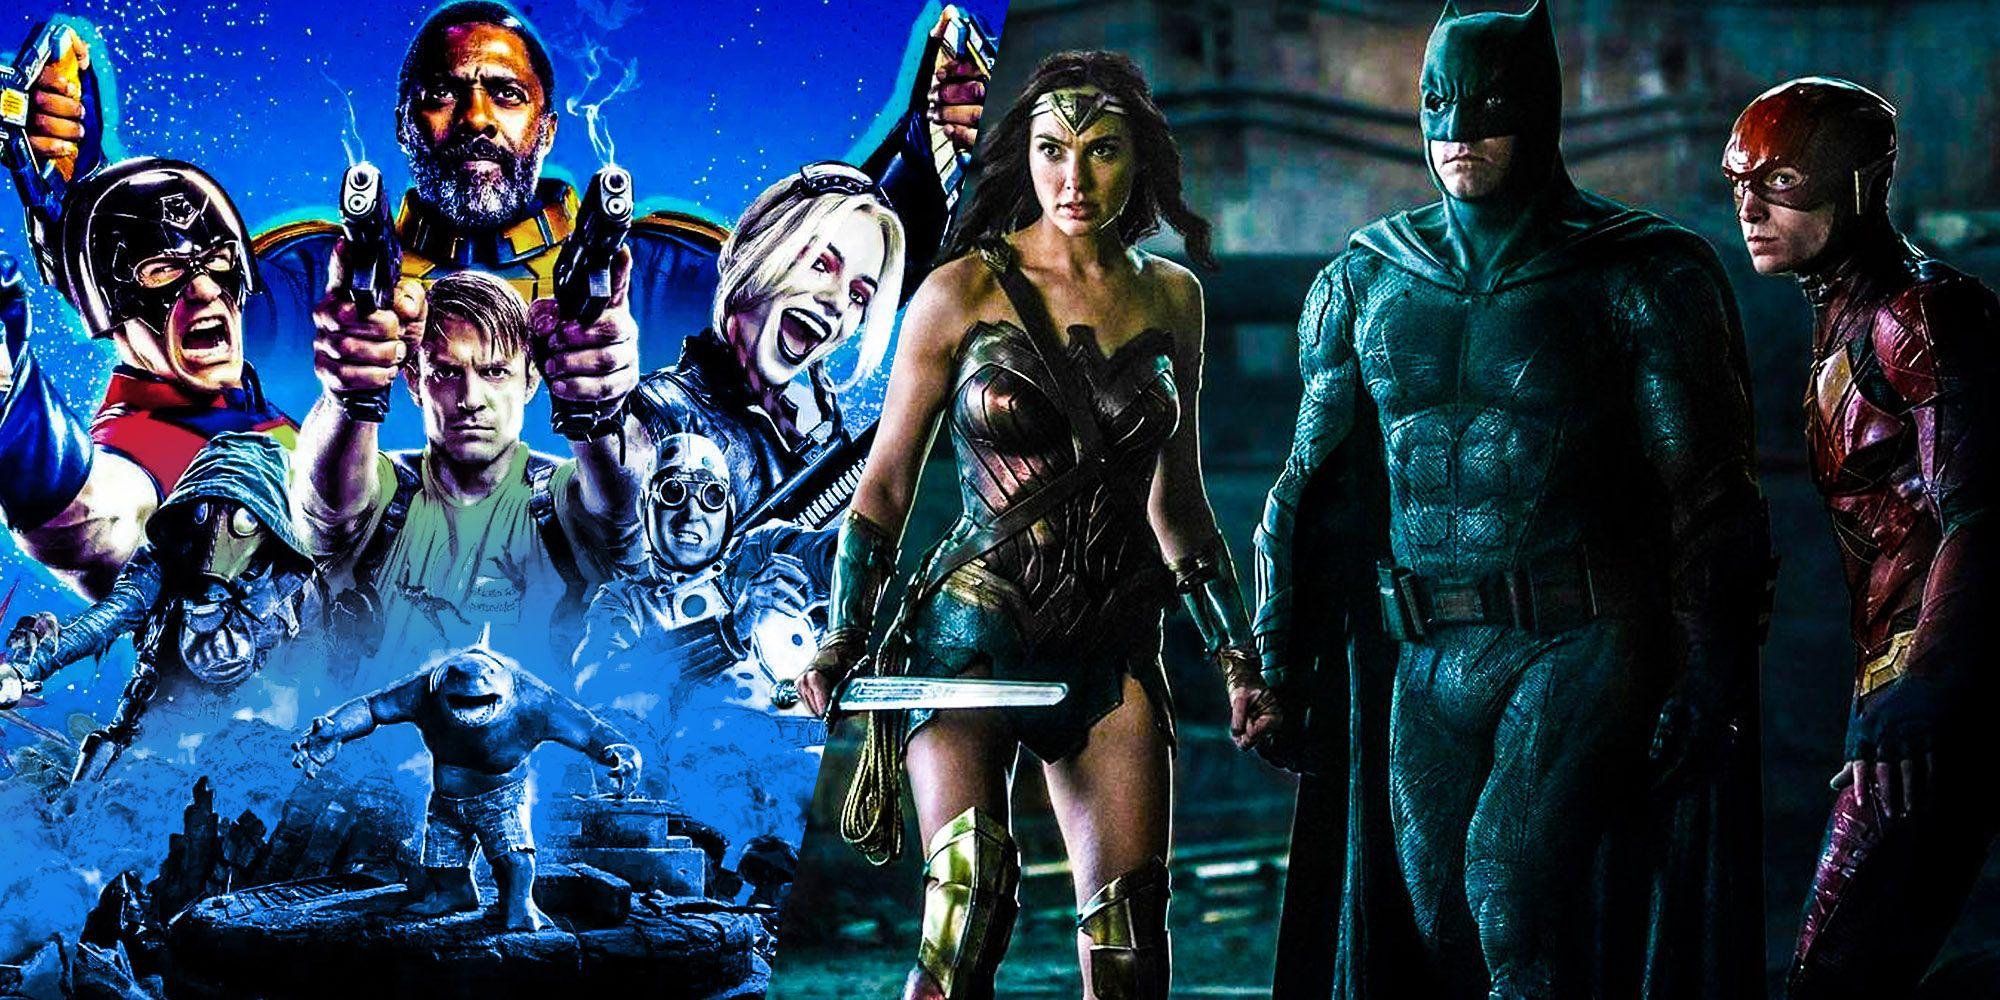 James Gunn Responds To Suicide Squad Vs Justice League Movie Pitch